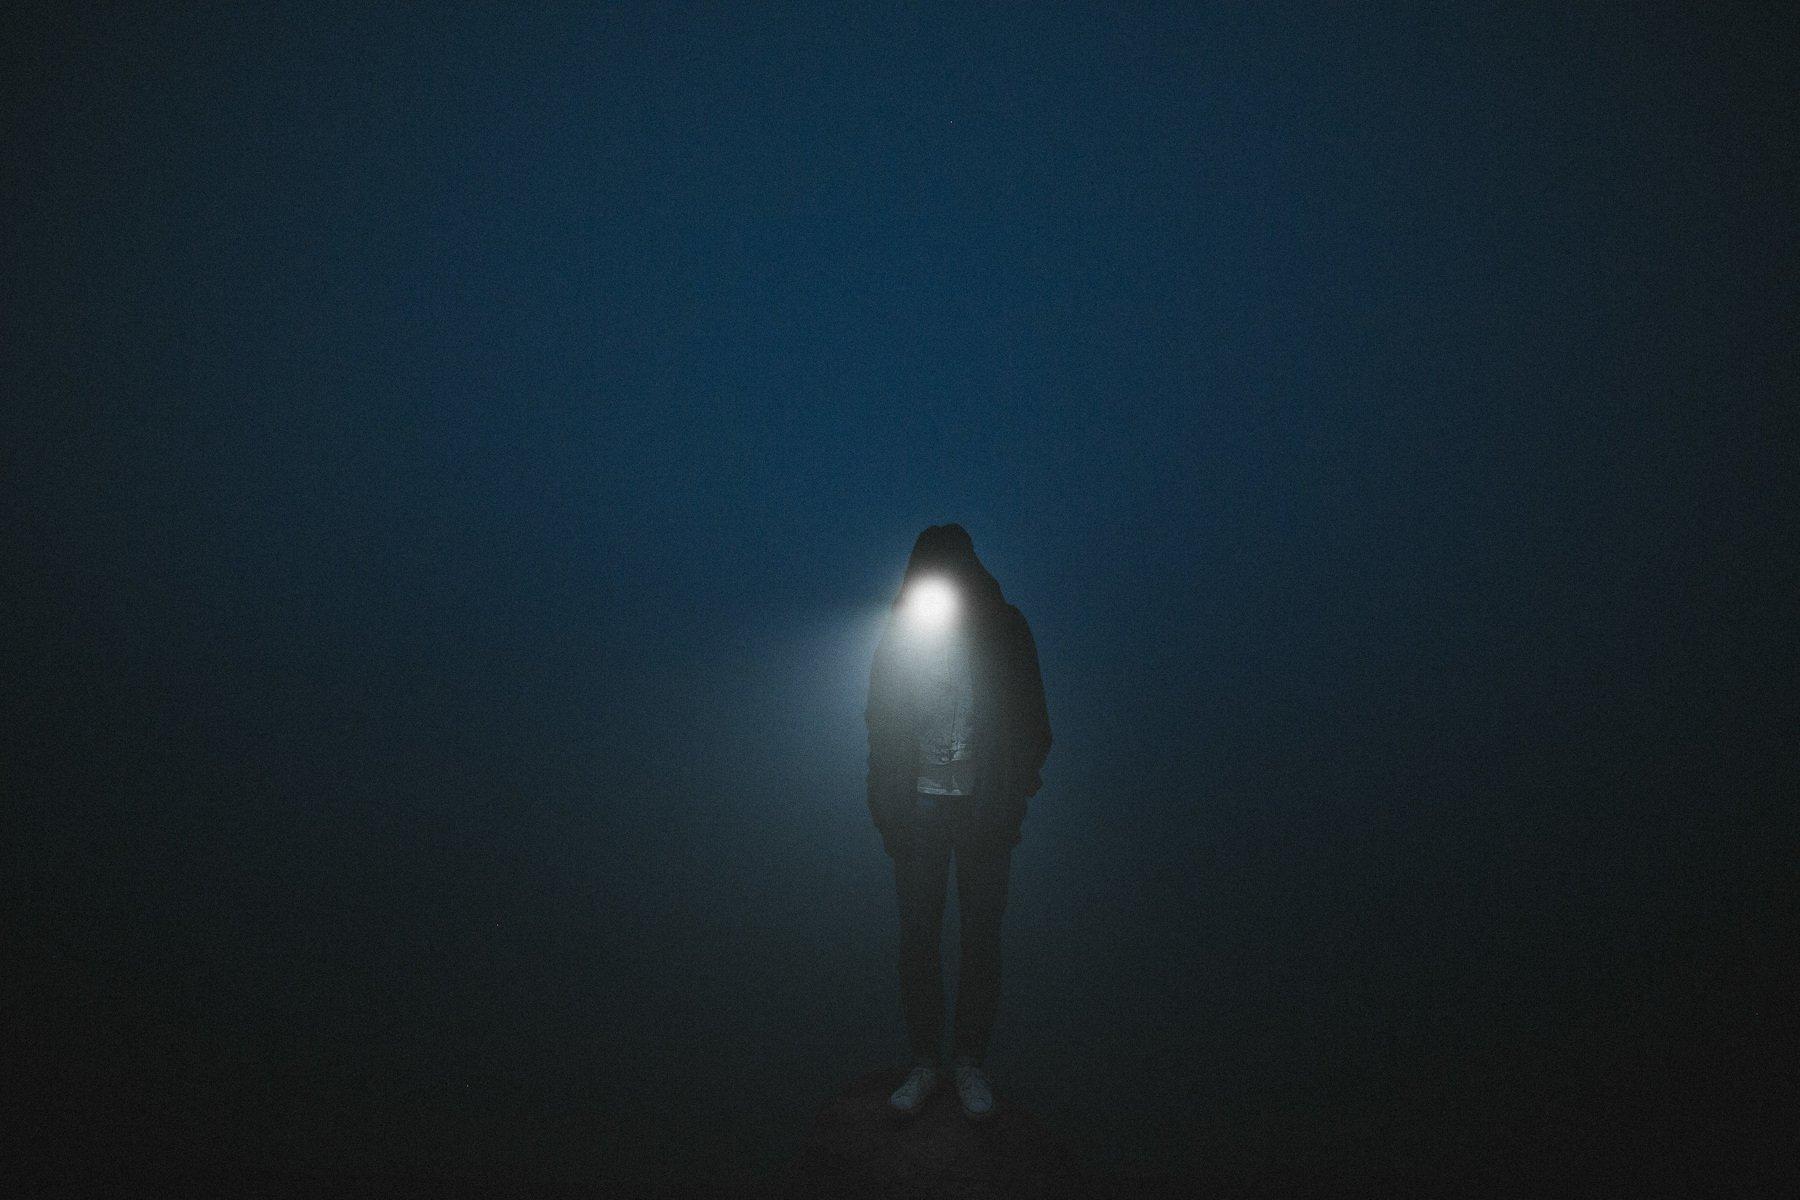 туман ночь свет, Воронин Вова